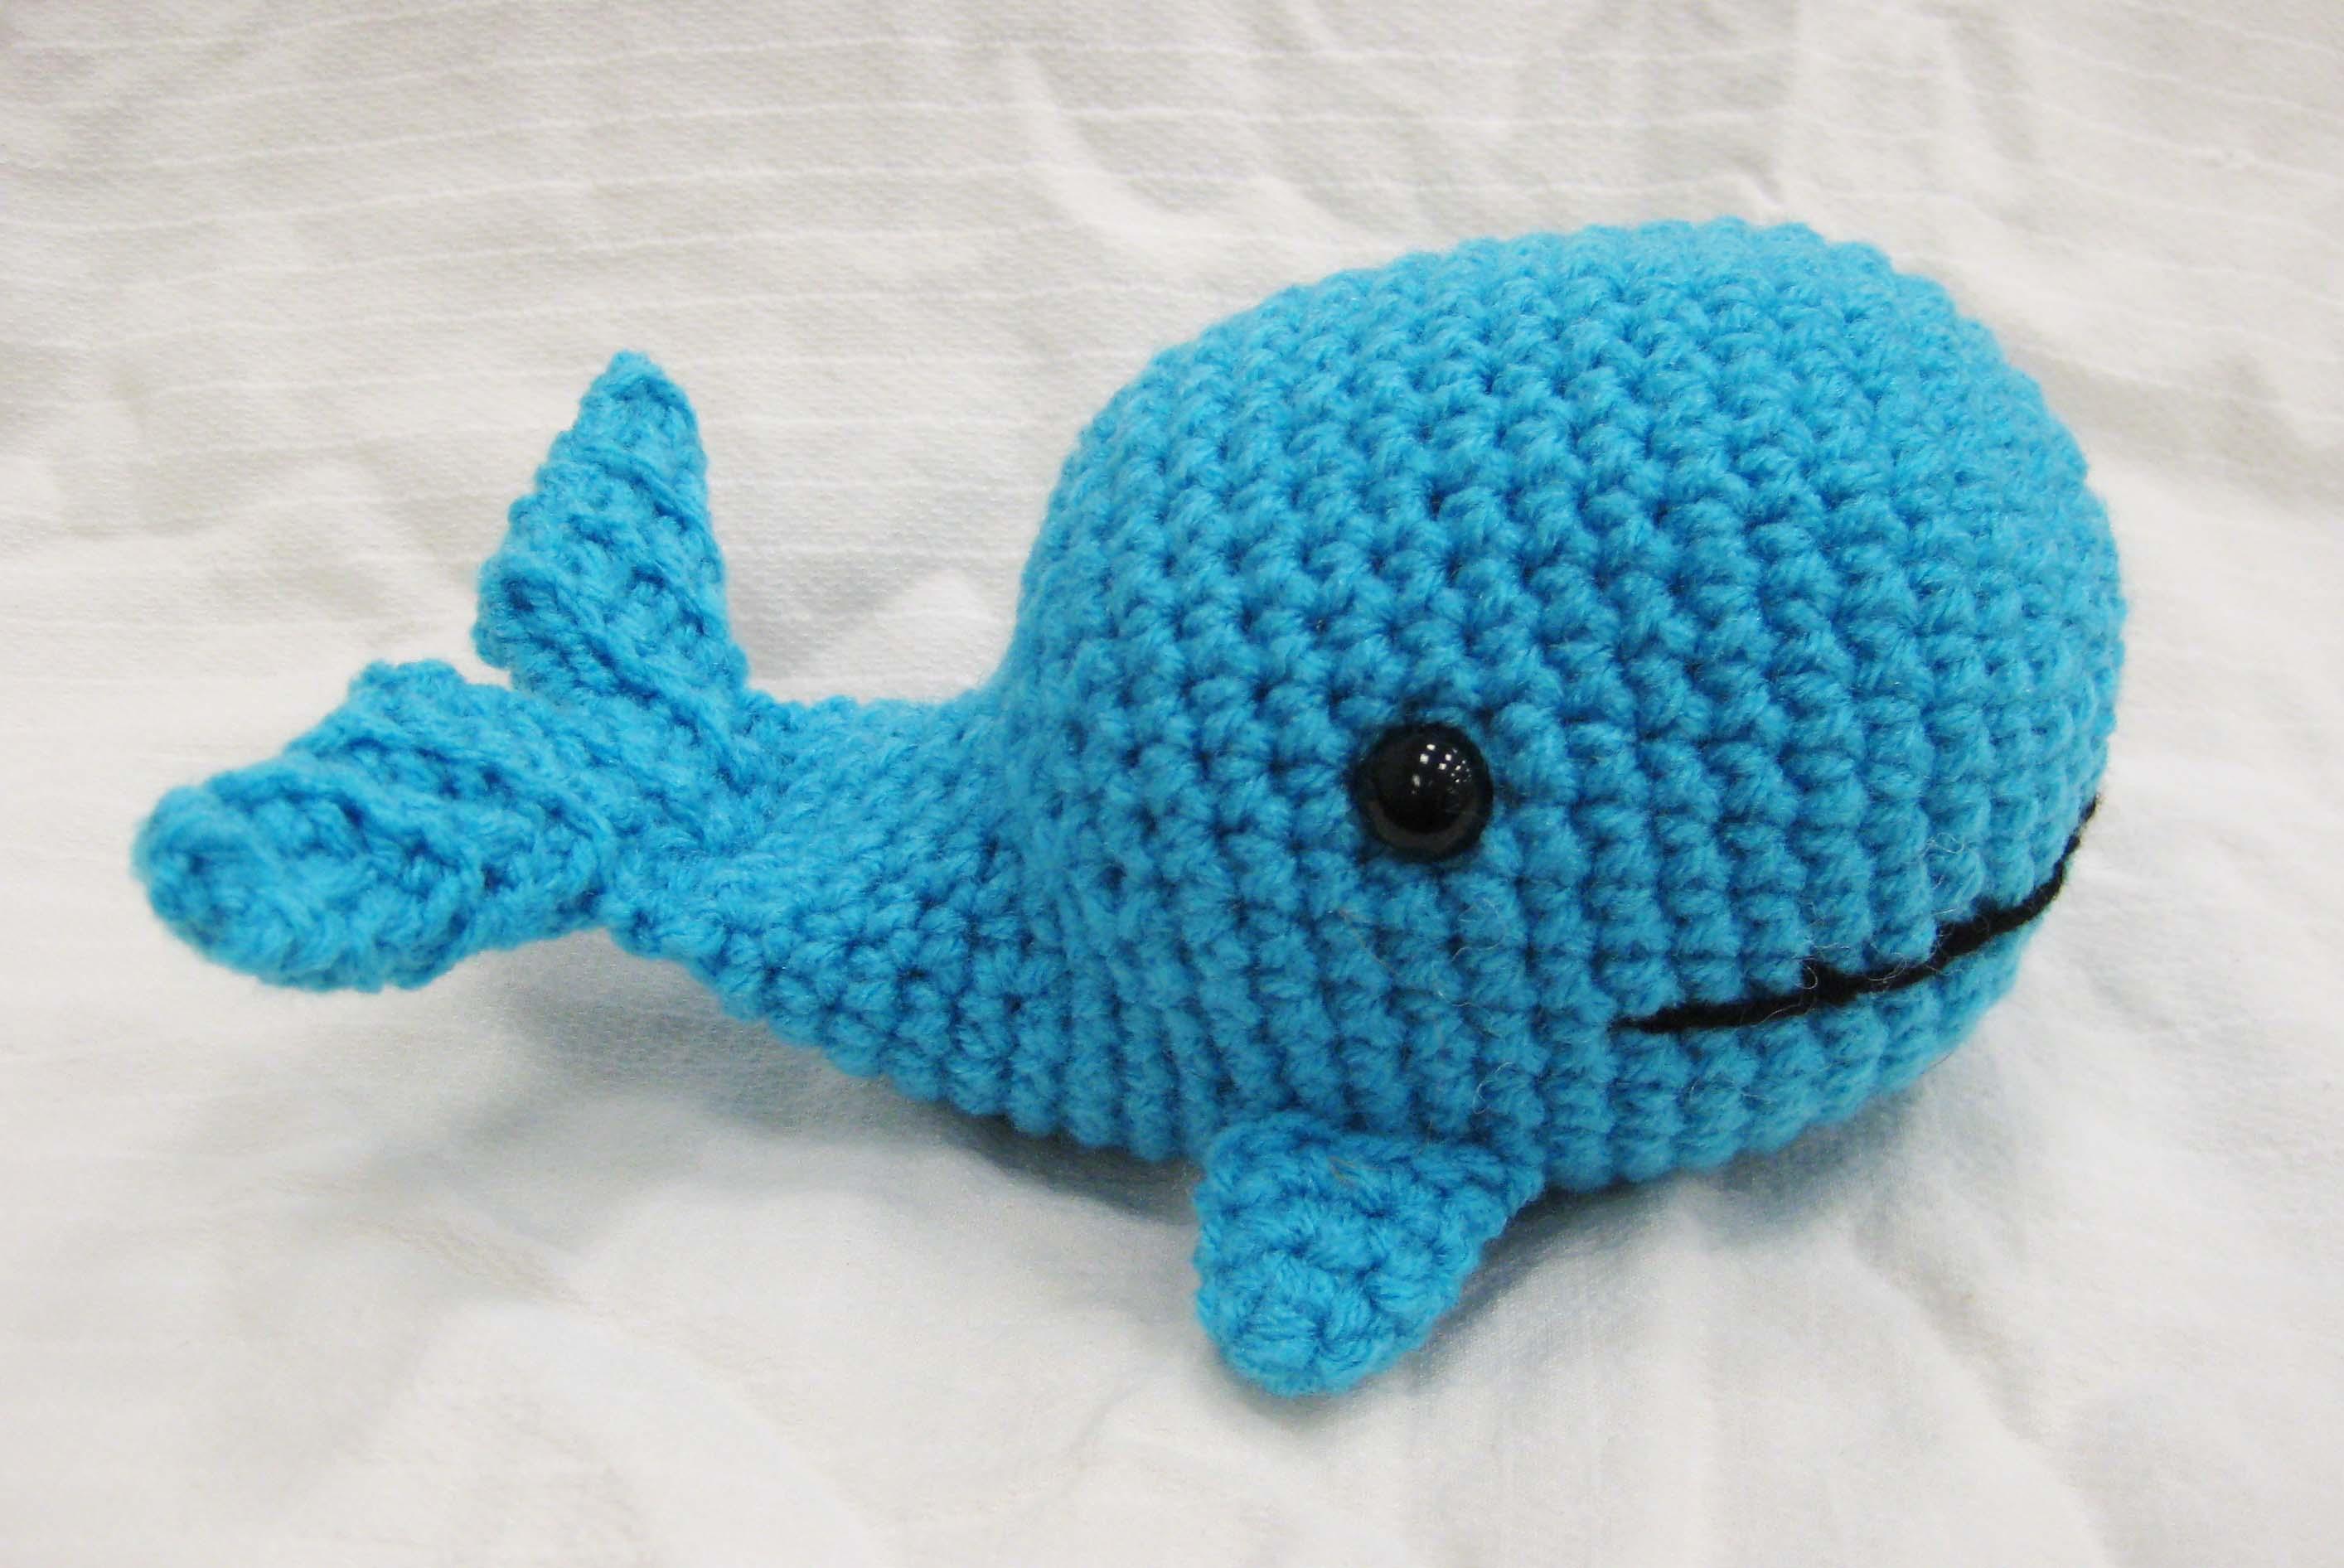 Crochet whale amigurumi pattern | Amigurumi Space | 1892x2828